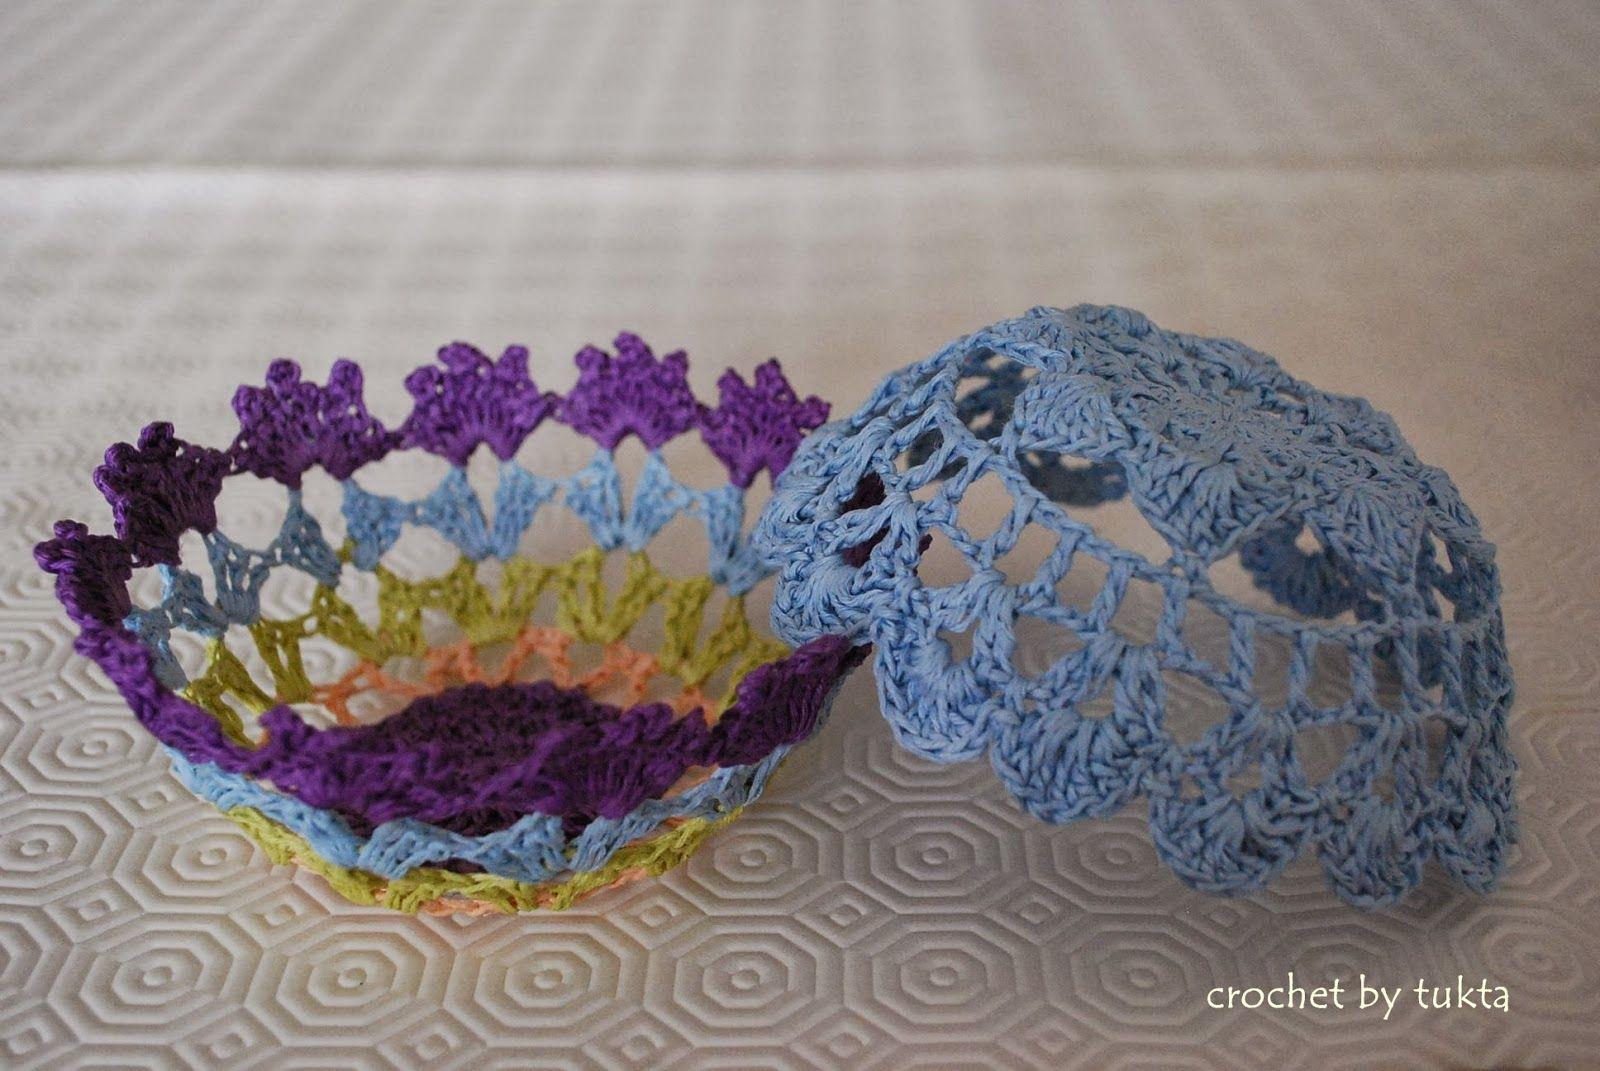 Crochet by Tukta: bowl